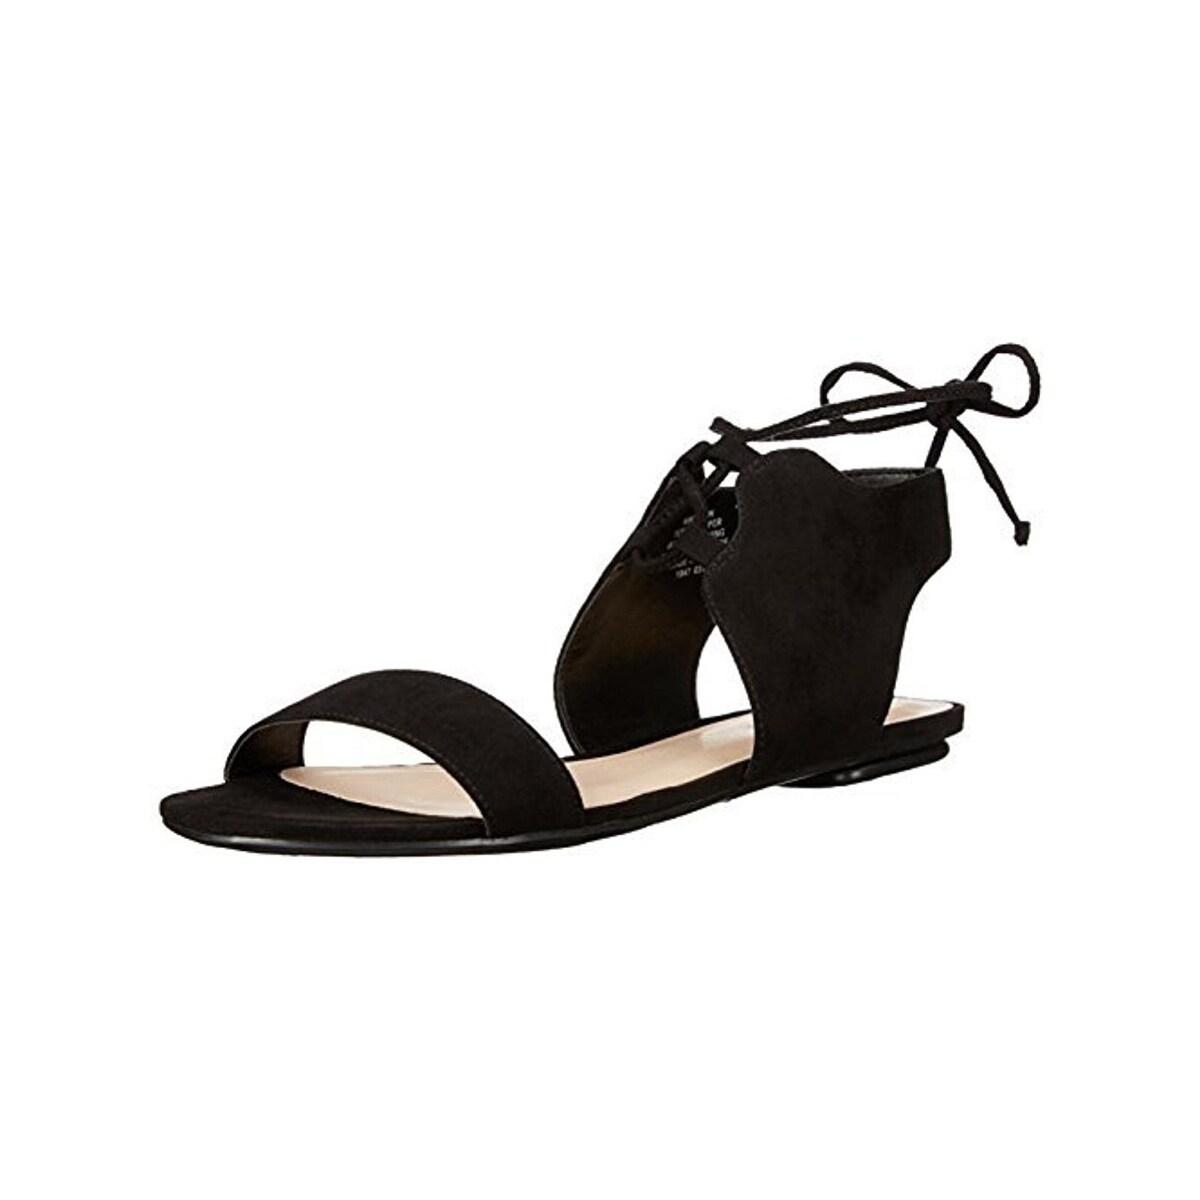 9980c36062fa Nine West Womens Jadlin Flat Sandals Faux Suede Ankle Wrap - 7.5 Medium (B